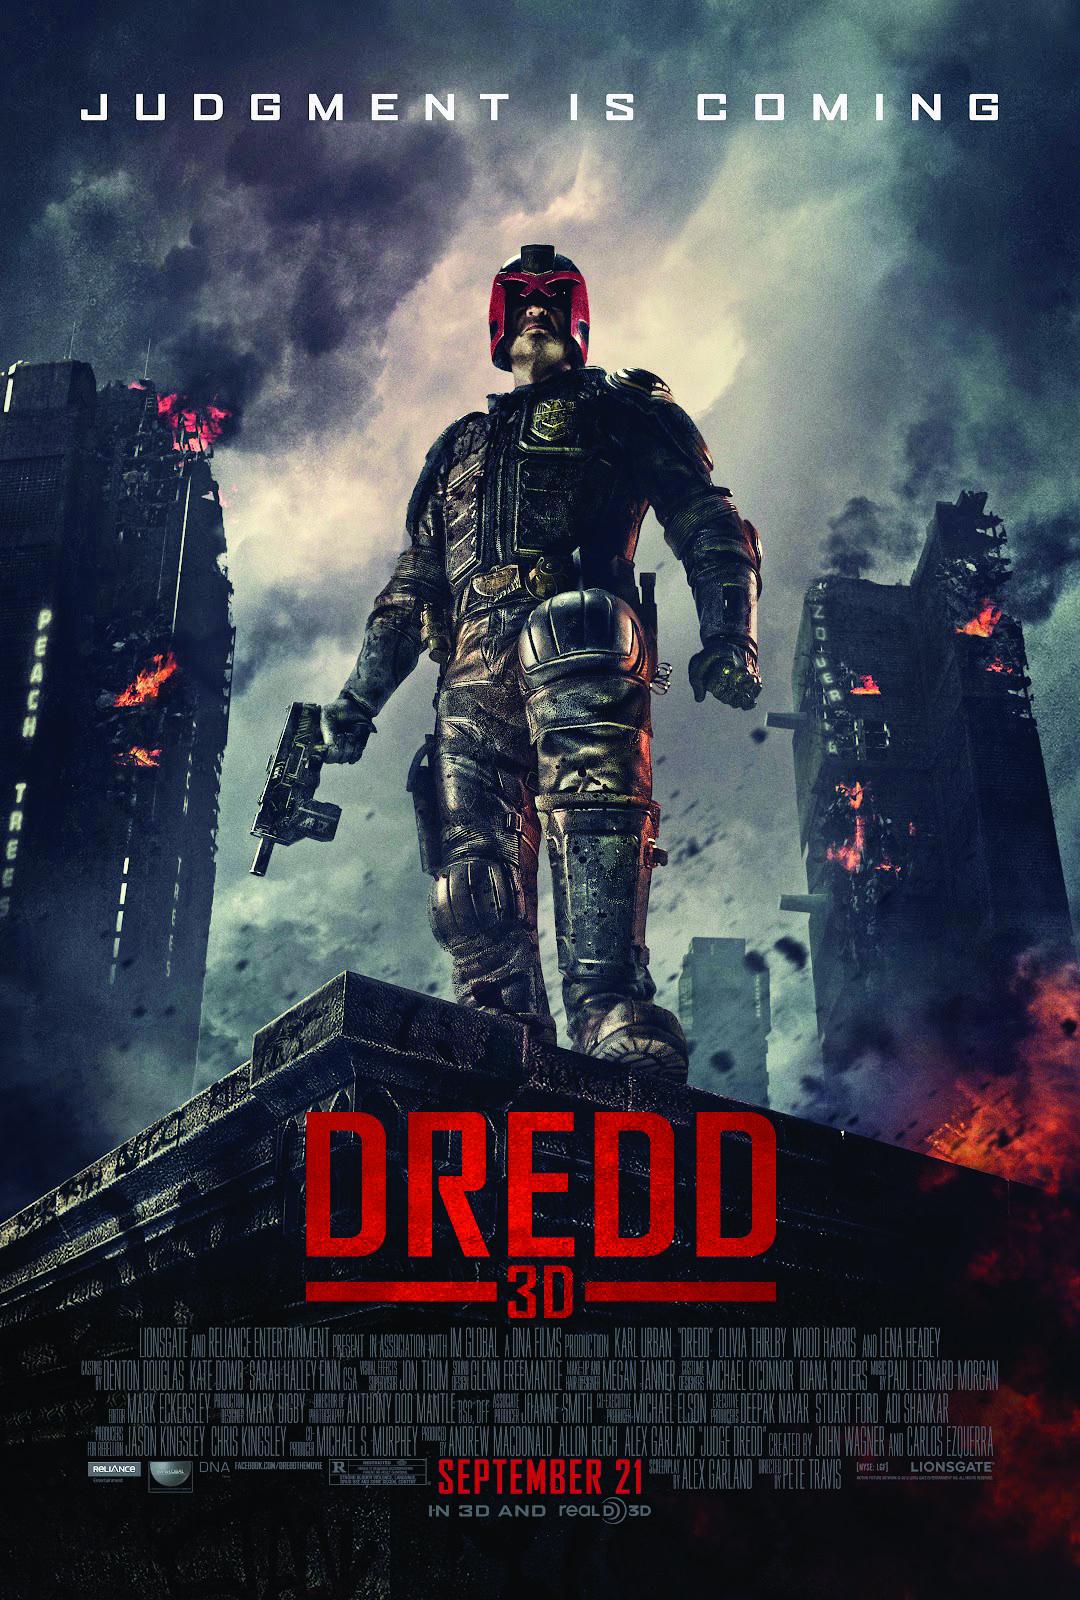 Judge Dredd Movie Dredd movie, Dredd 2012, Action movies